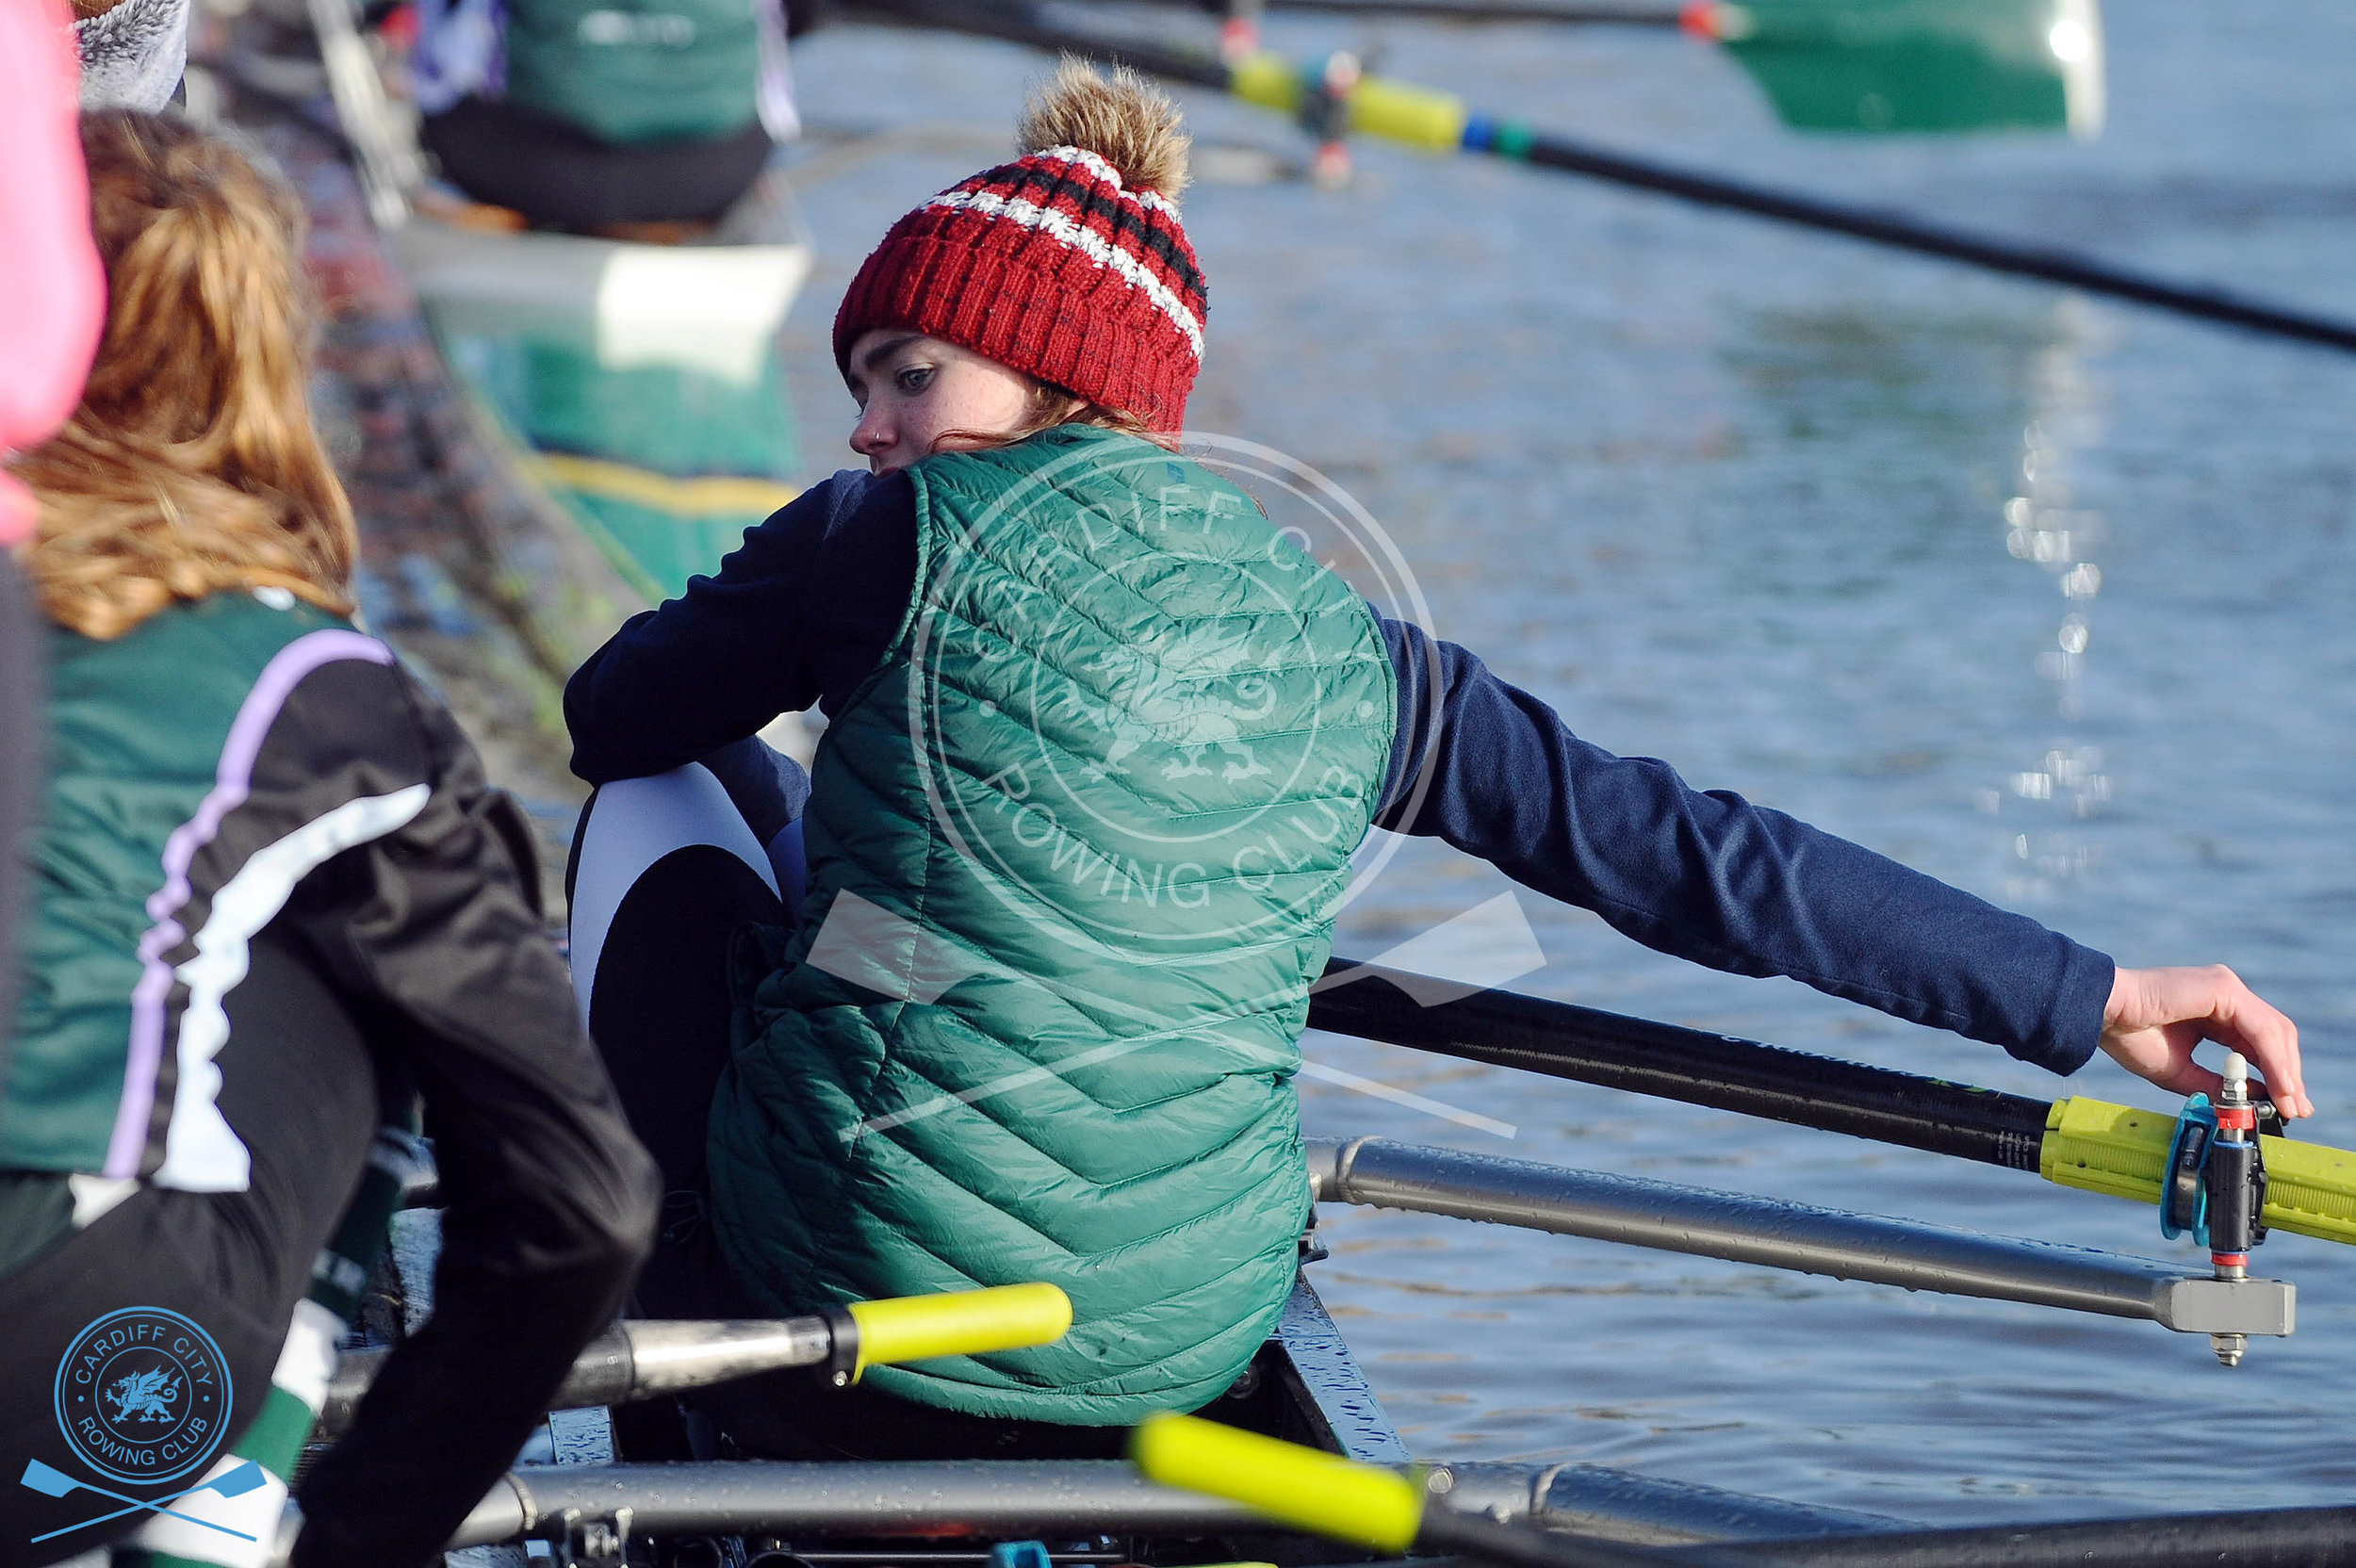 DW_280119_Cardiff_City_Rowing_353.jpg